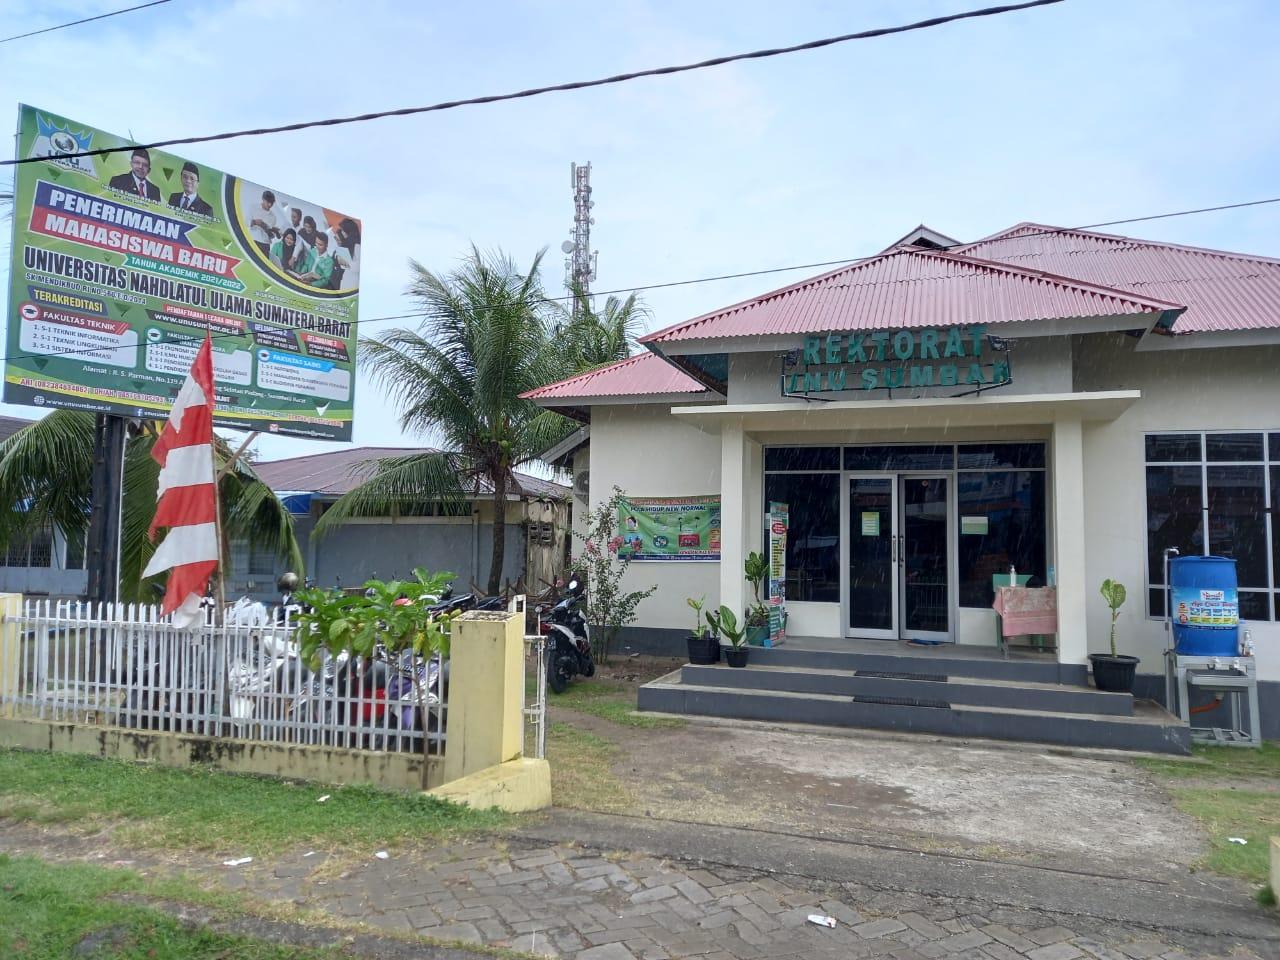 Gedung Rektorat Universitas Nahdlatul Ulama Sumatera Barat